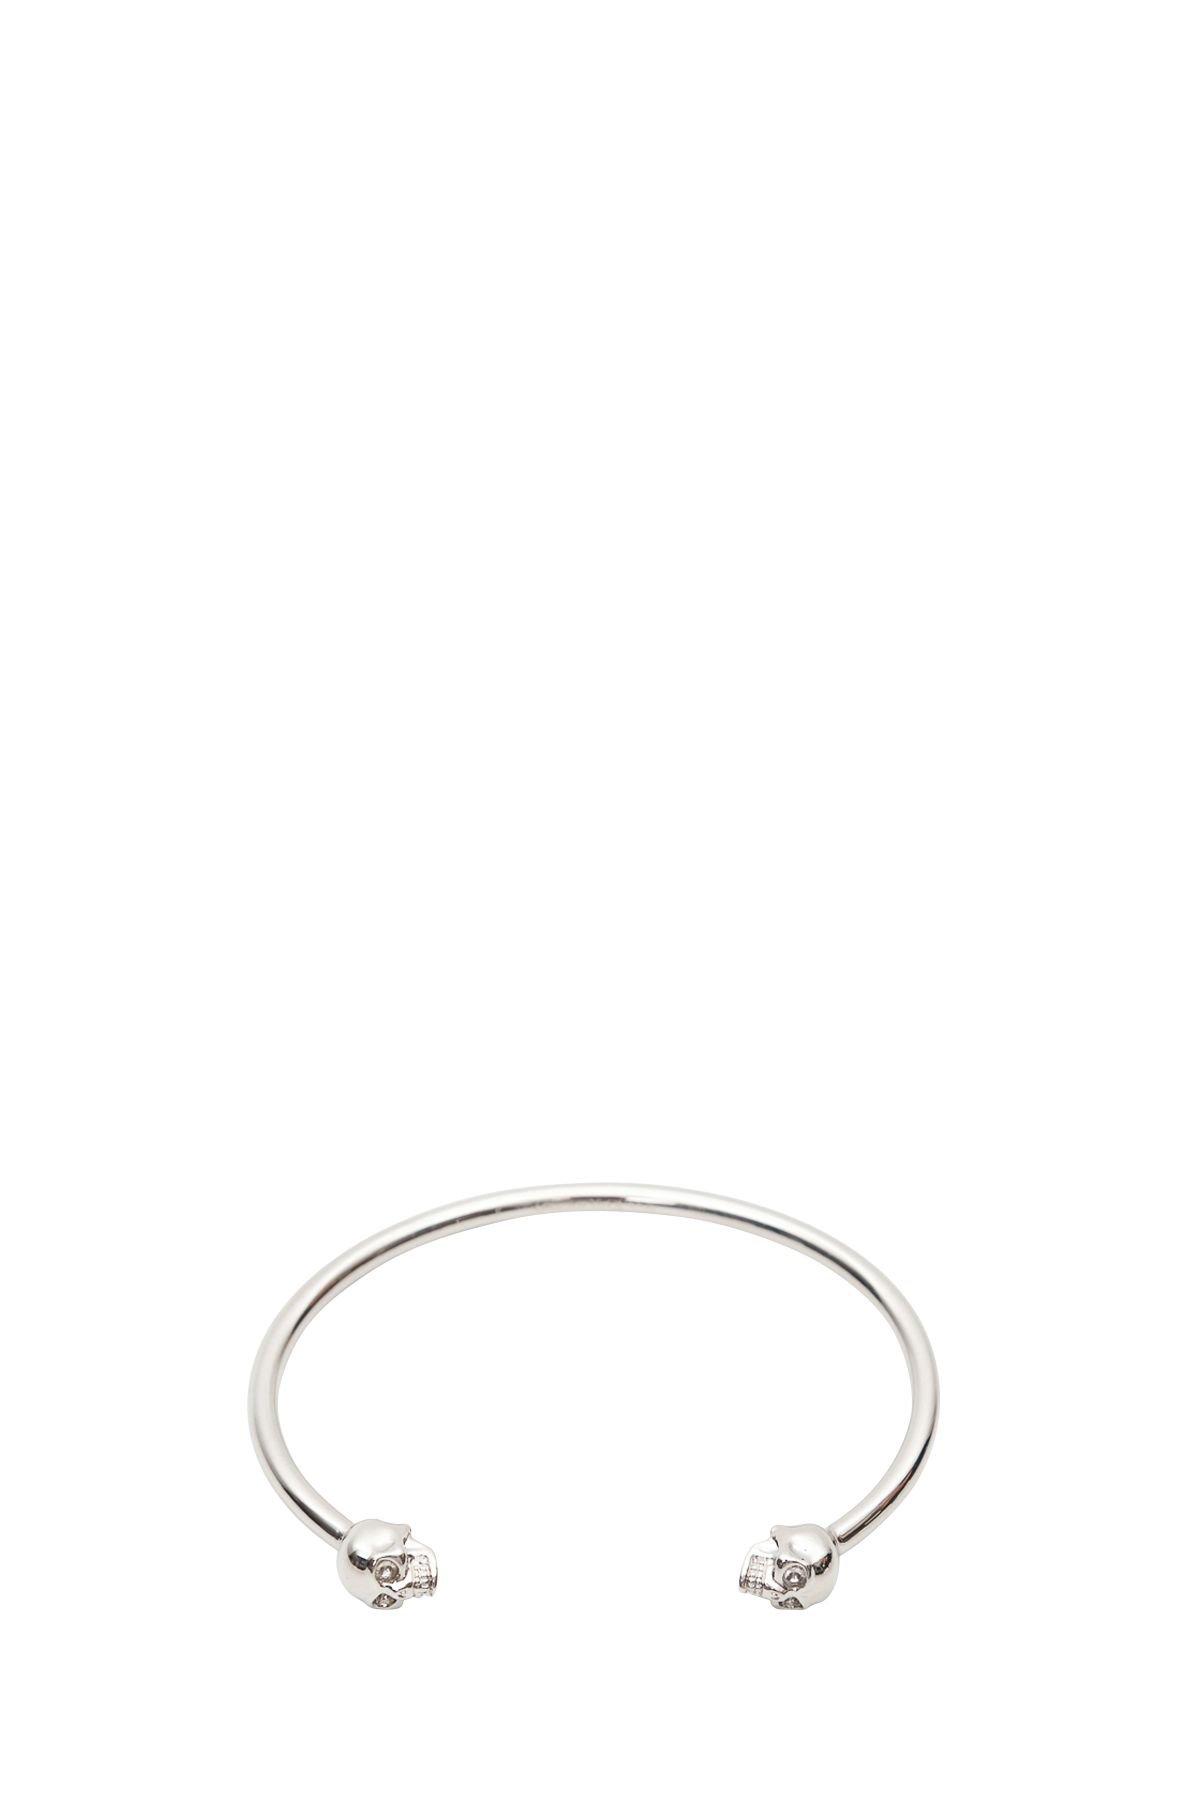 Alexander McQueen Skull Silver-tone Brass Bracelet